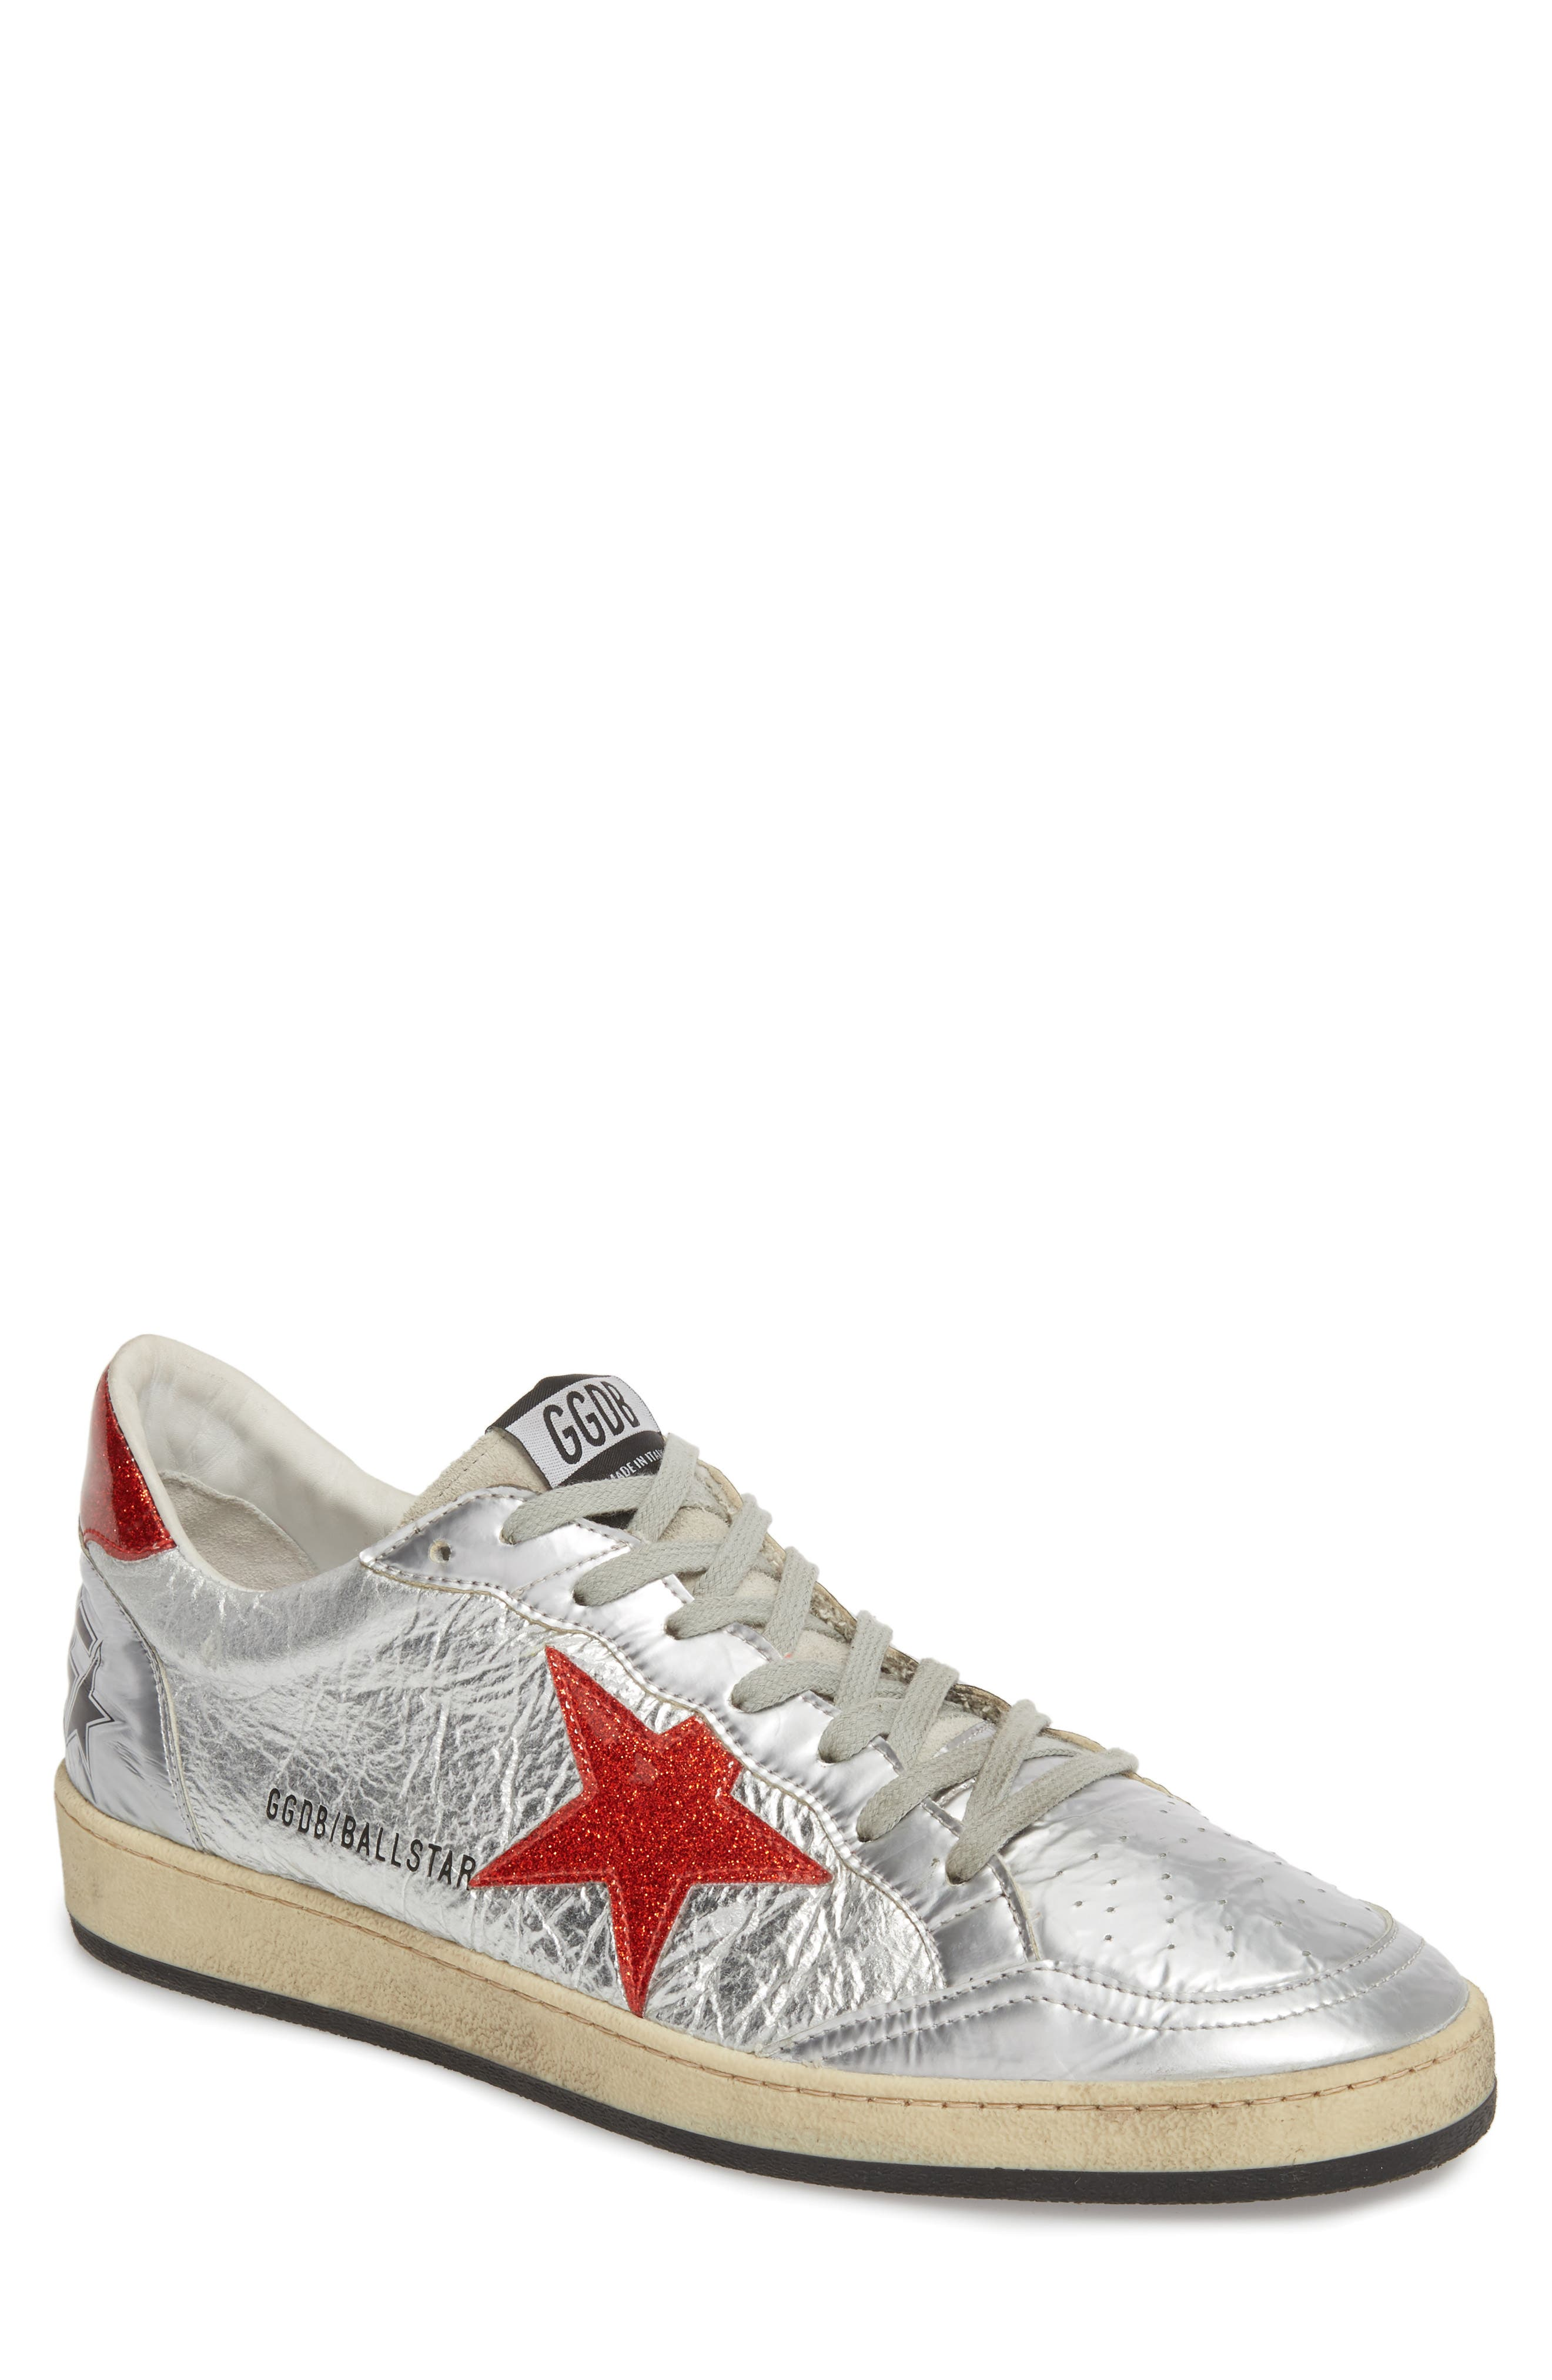 B-Ball Star Sneaker,                         Main,                         color, Silver-Red Glitter- Star Dance